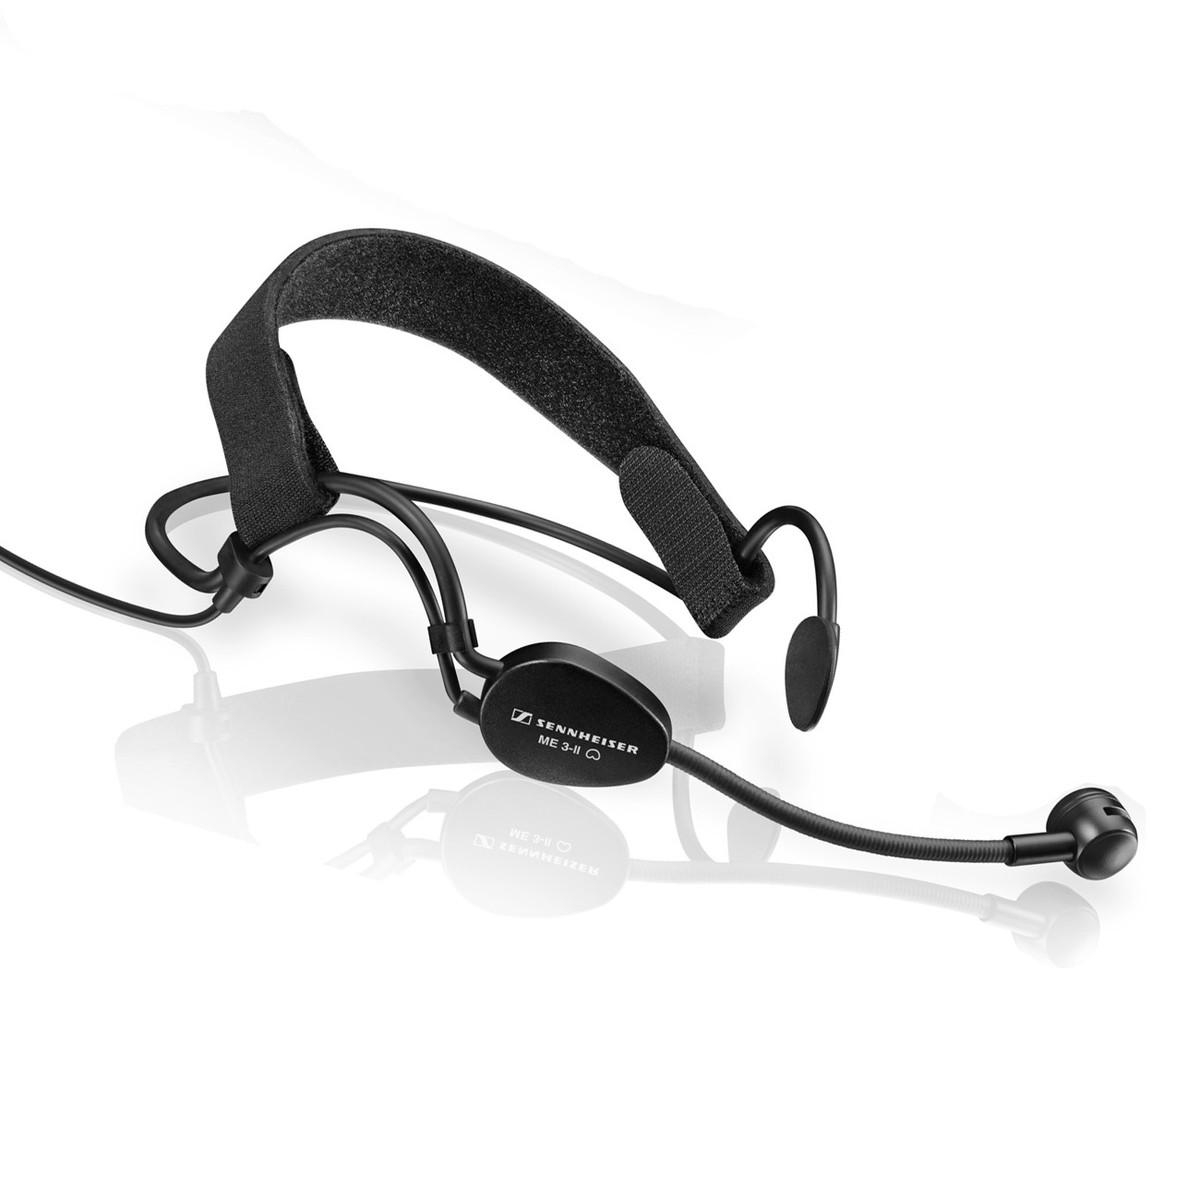 sennheiser ew d1 me3 digital wireless headset microphone system at gear4music. Black Bedroom Furniture Sets. Home Design Ideas